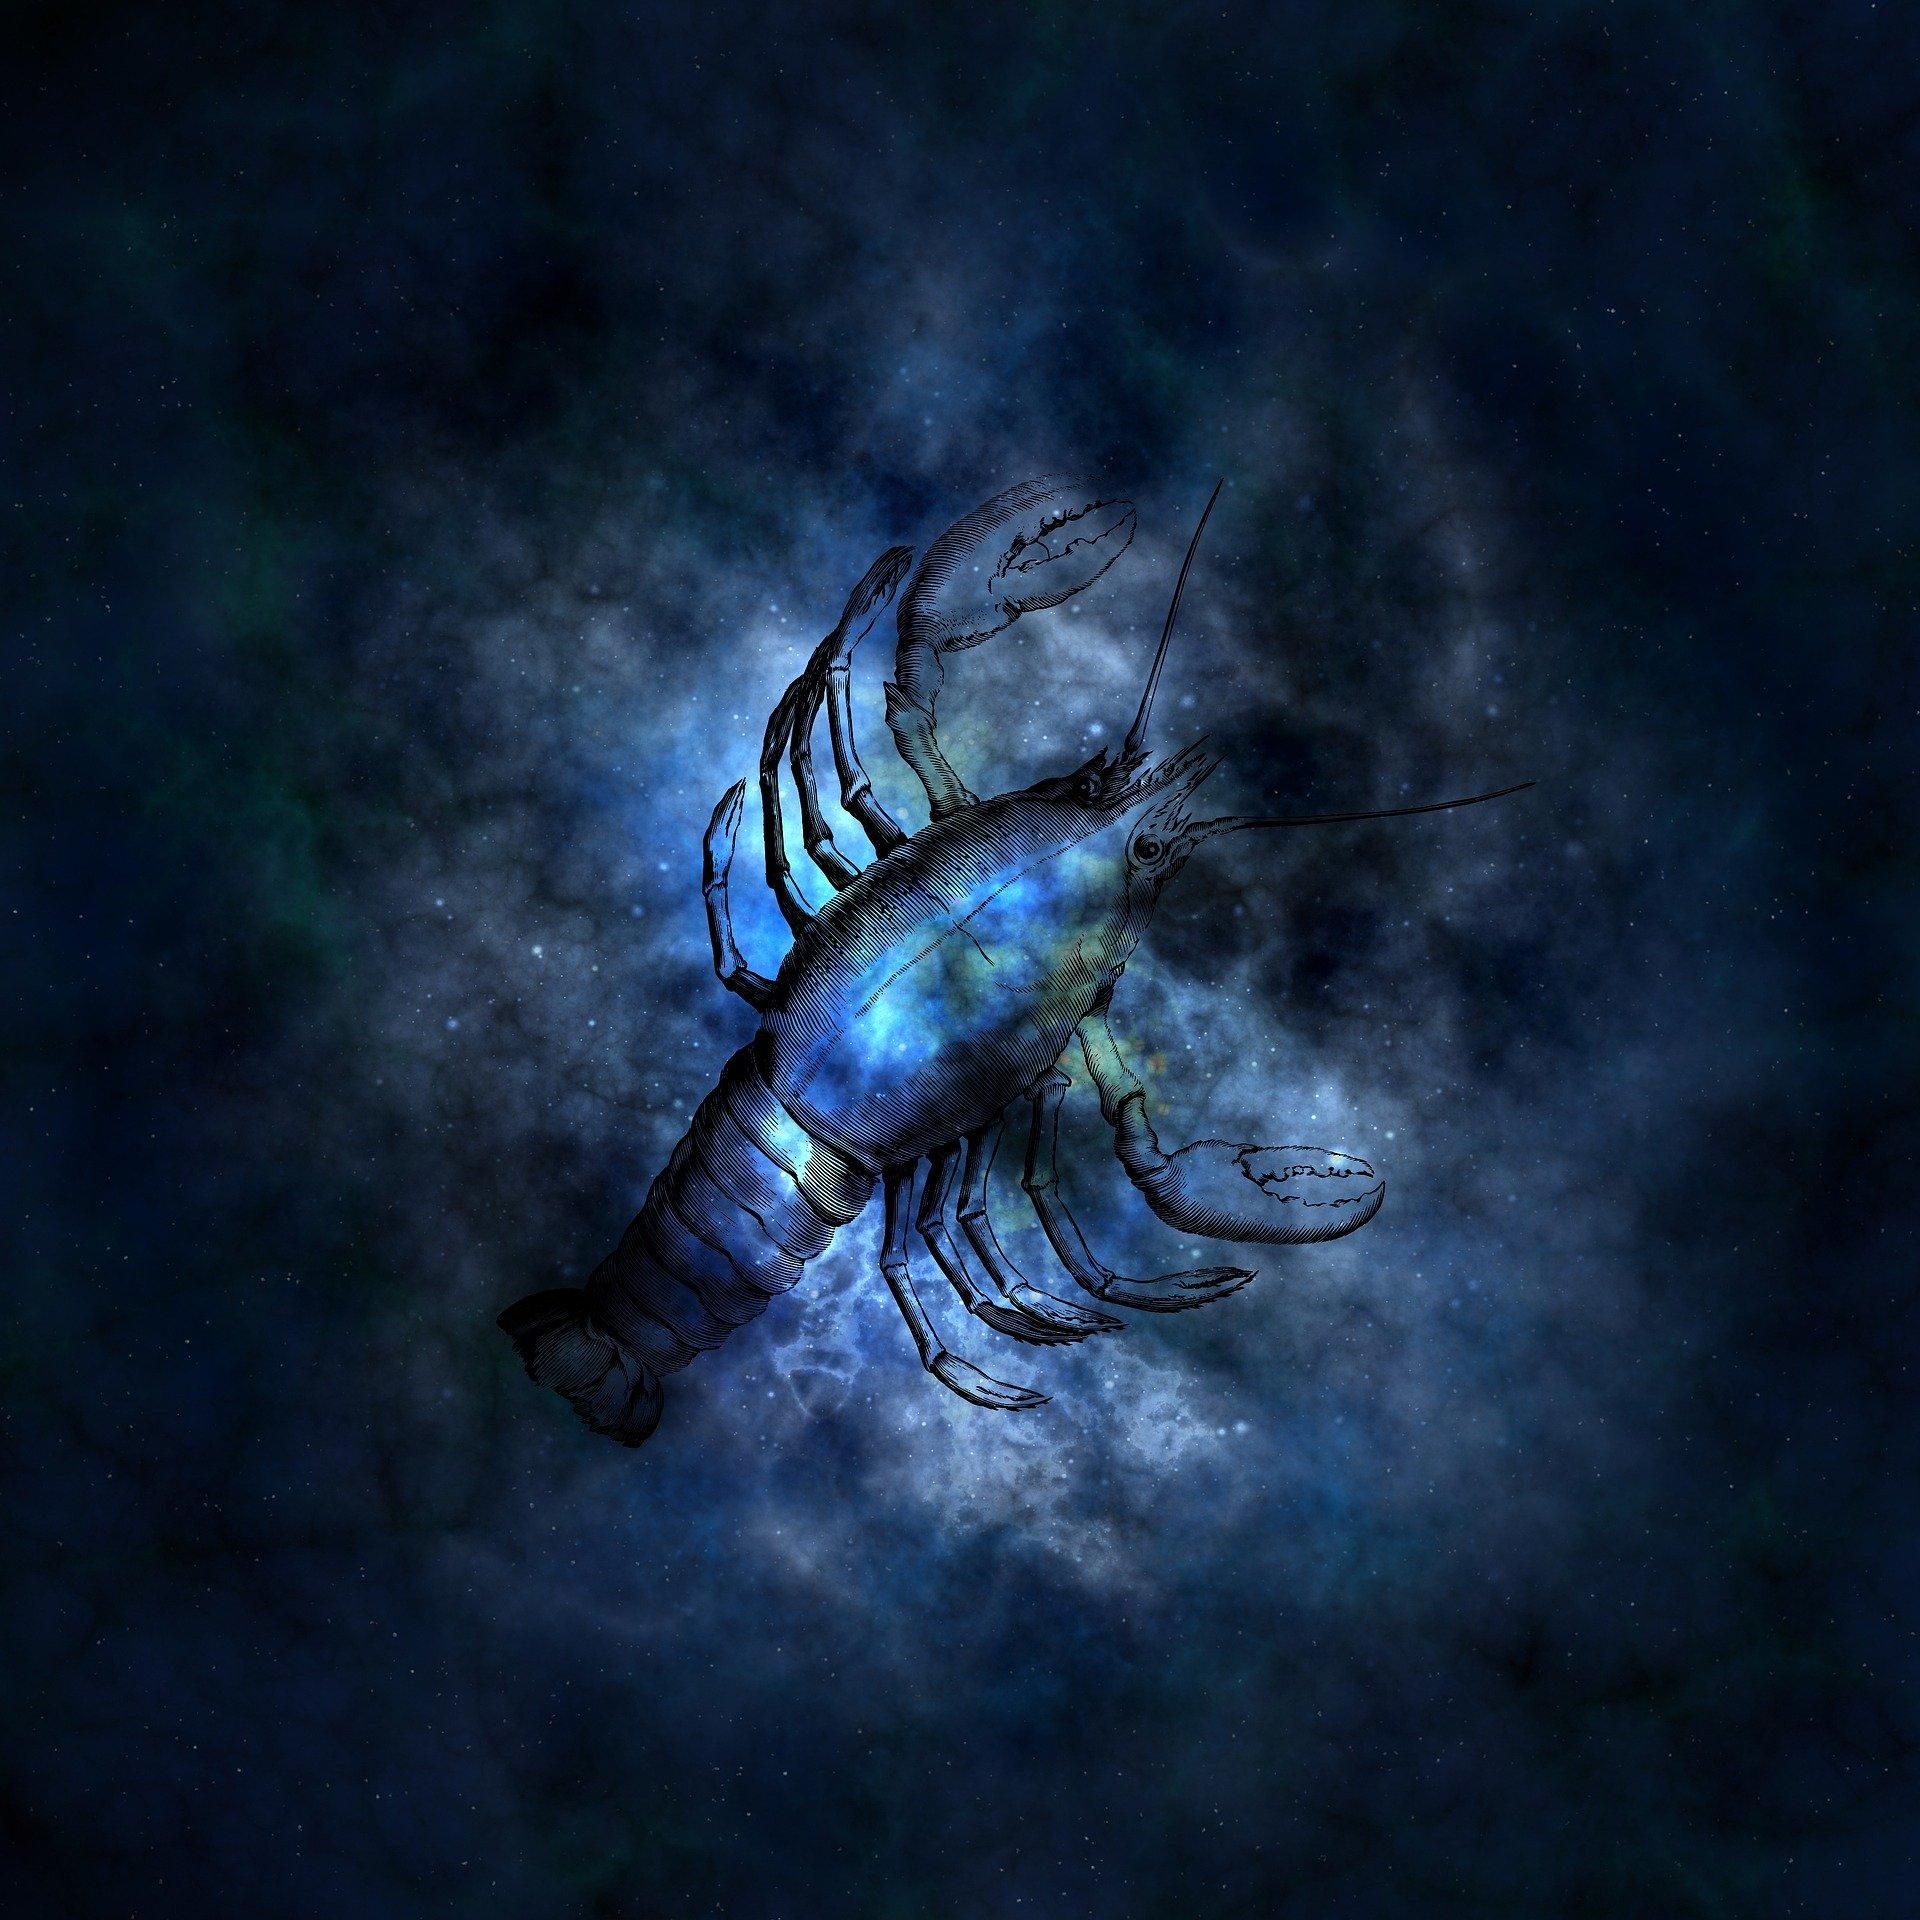 Horoscop săptămânal Minerva 7-13 septembrie 2020 - Rac